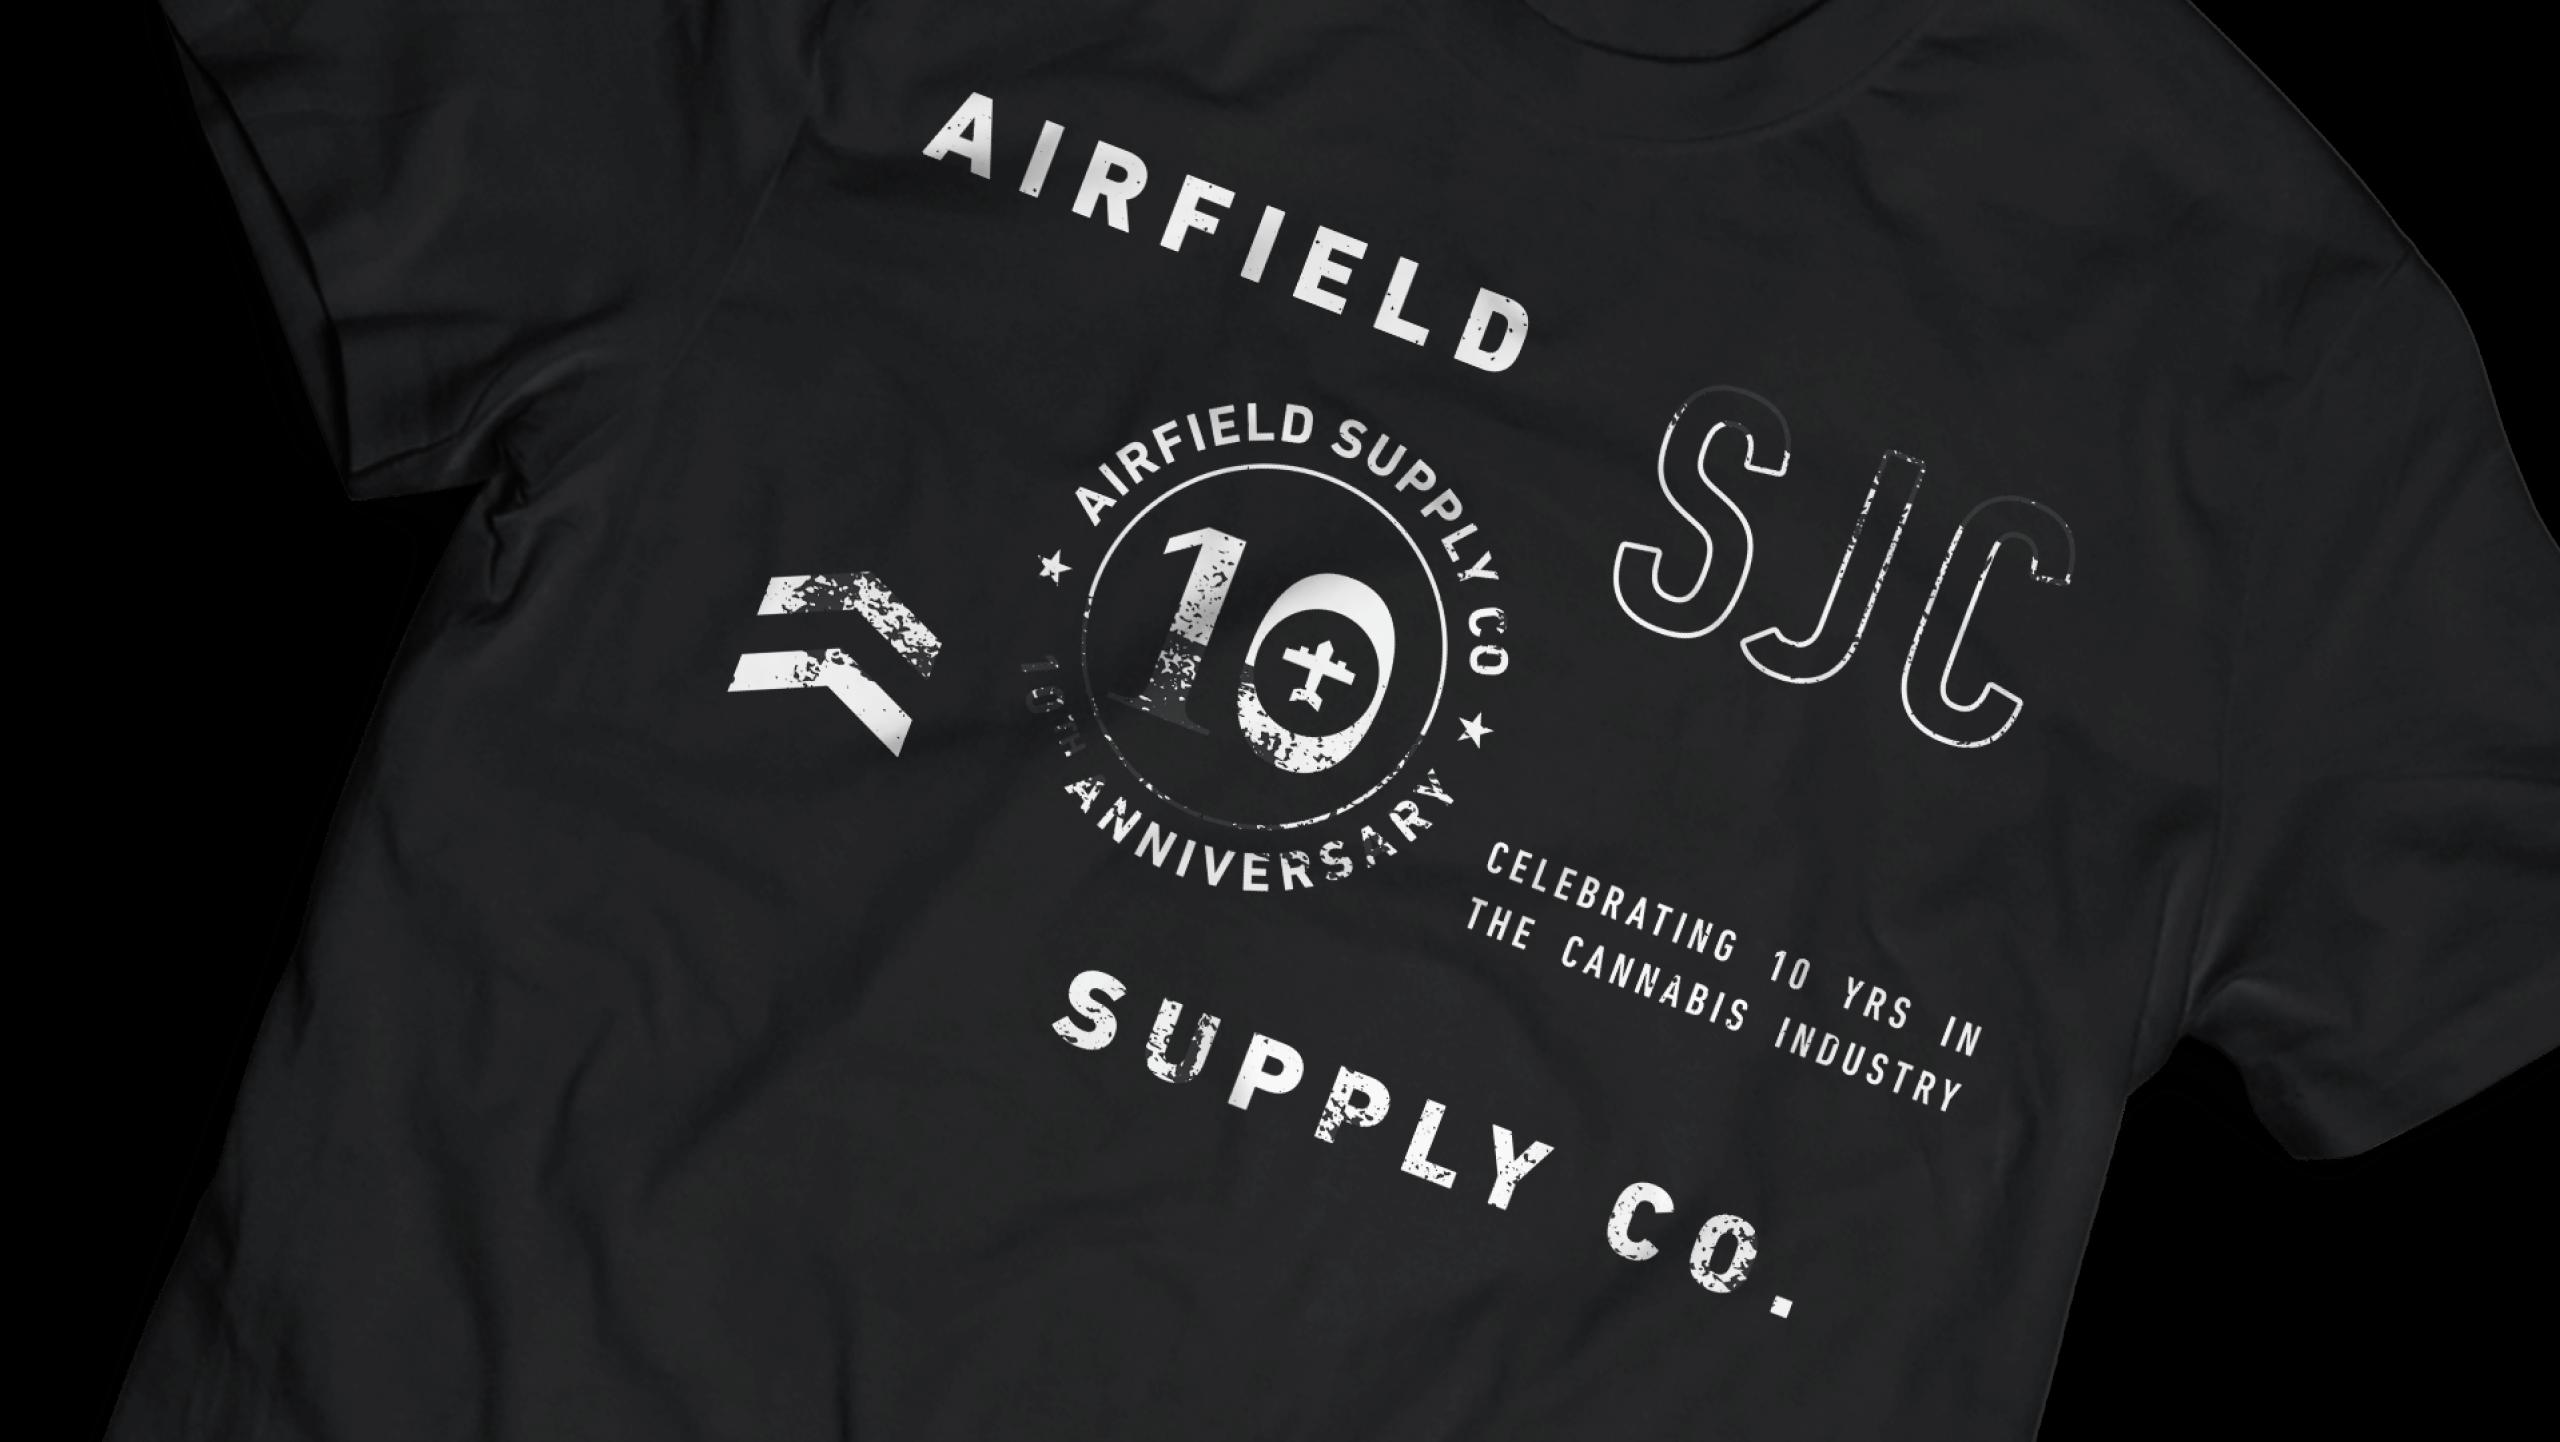 2020-Airfield10-Shirt_Option-B-View-201